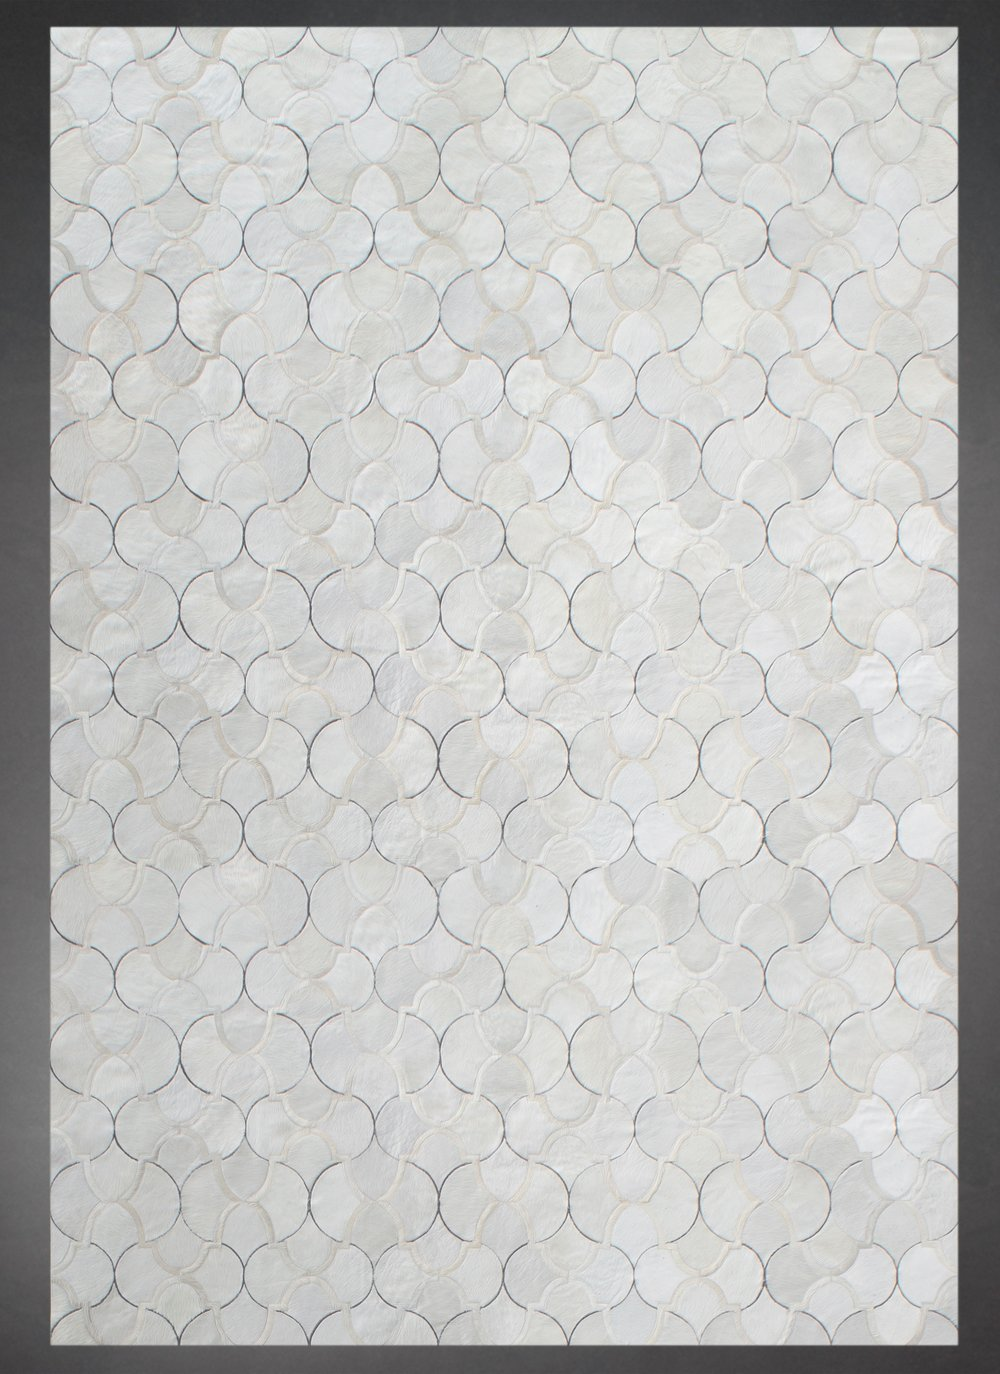 Contemporary designed fur rug in a geometric pattern in cream.